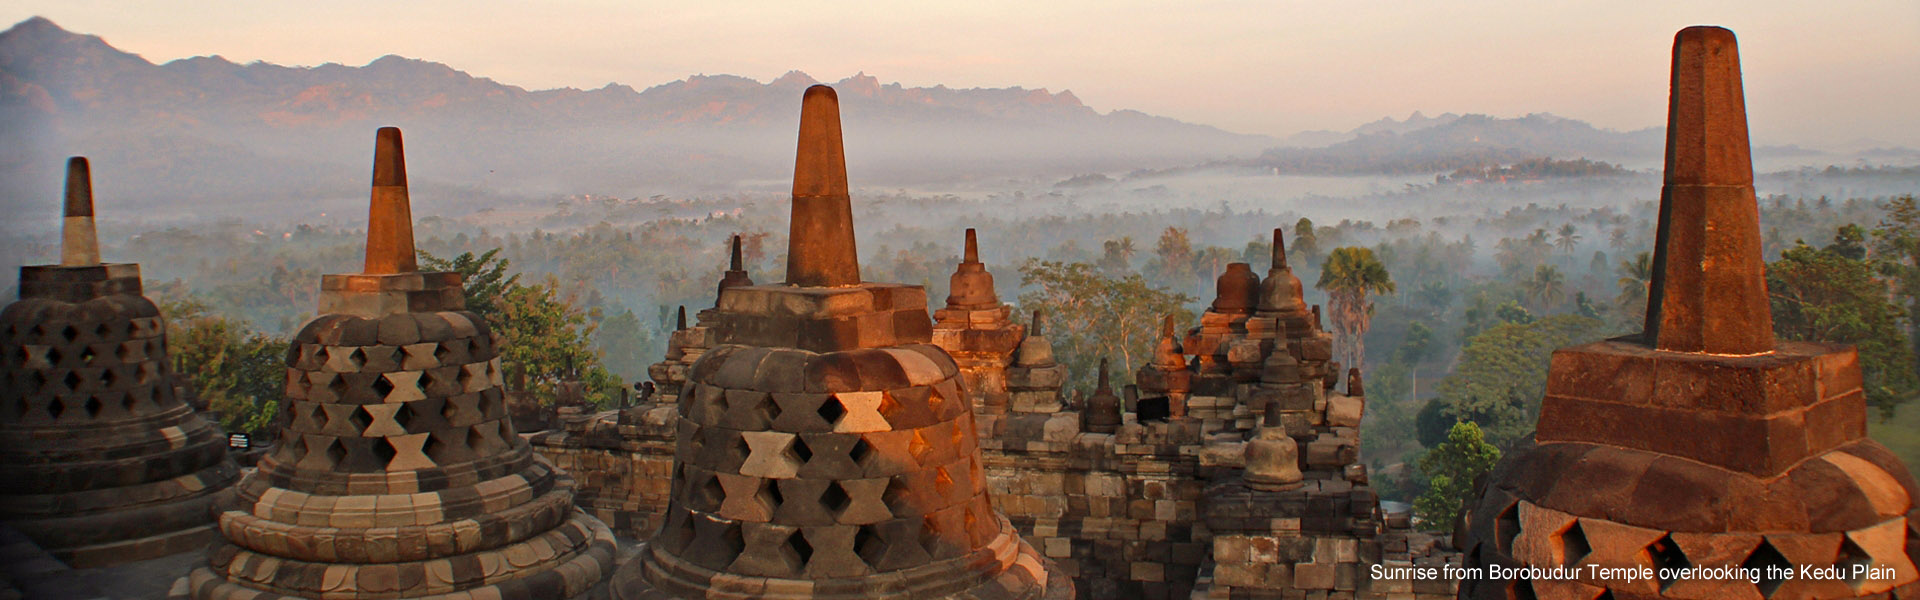 Sunrise from Borobudur Temple overlooking the Kedu Plain